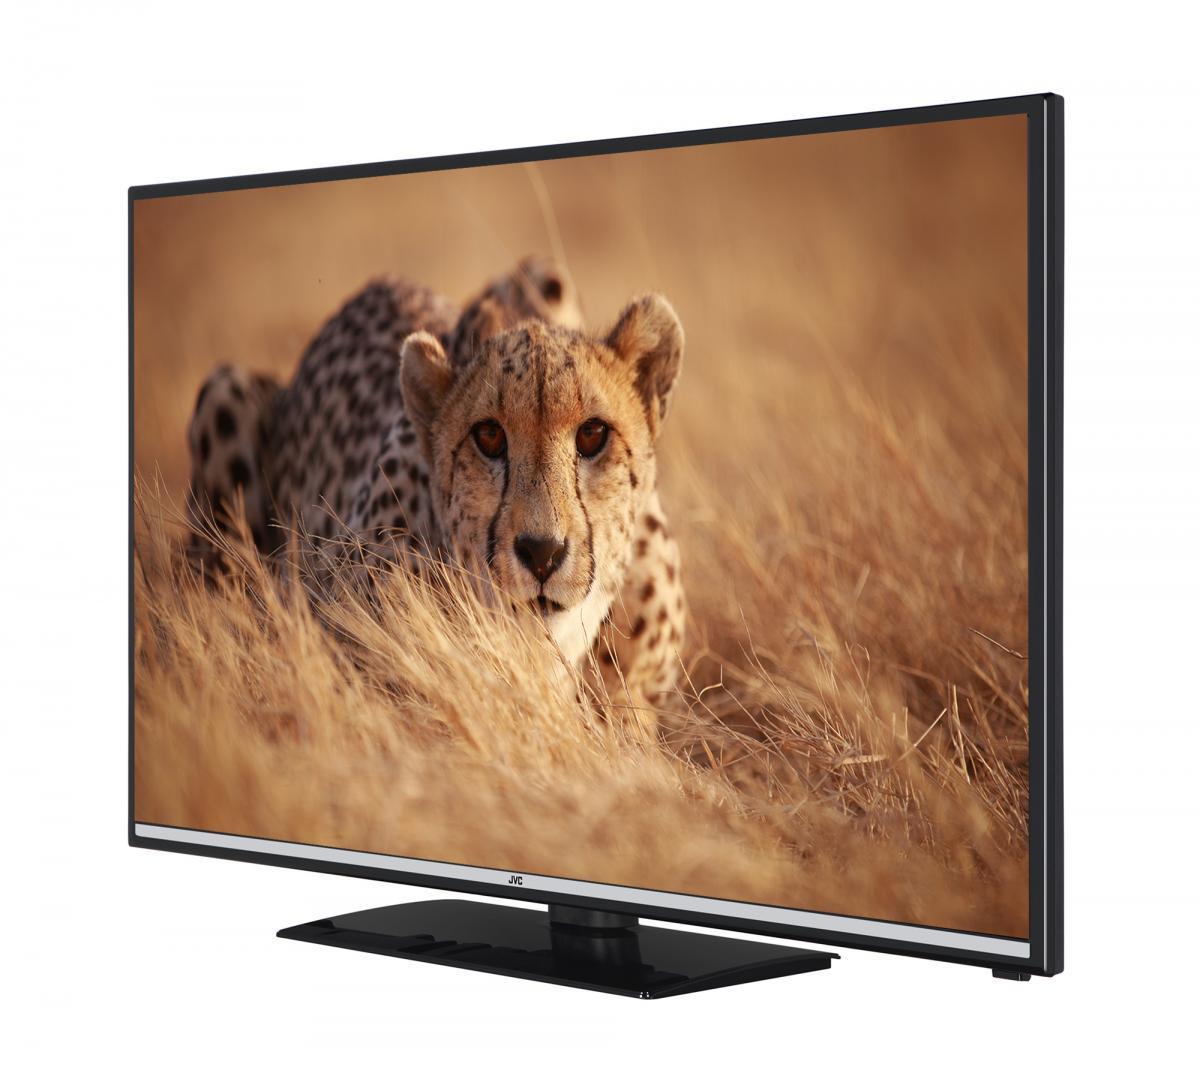 "Bild 3 von JVC LED TV 50"" (127 cm)"